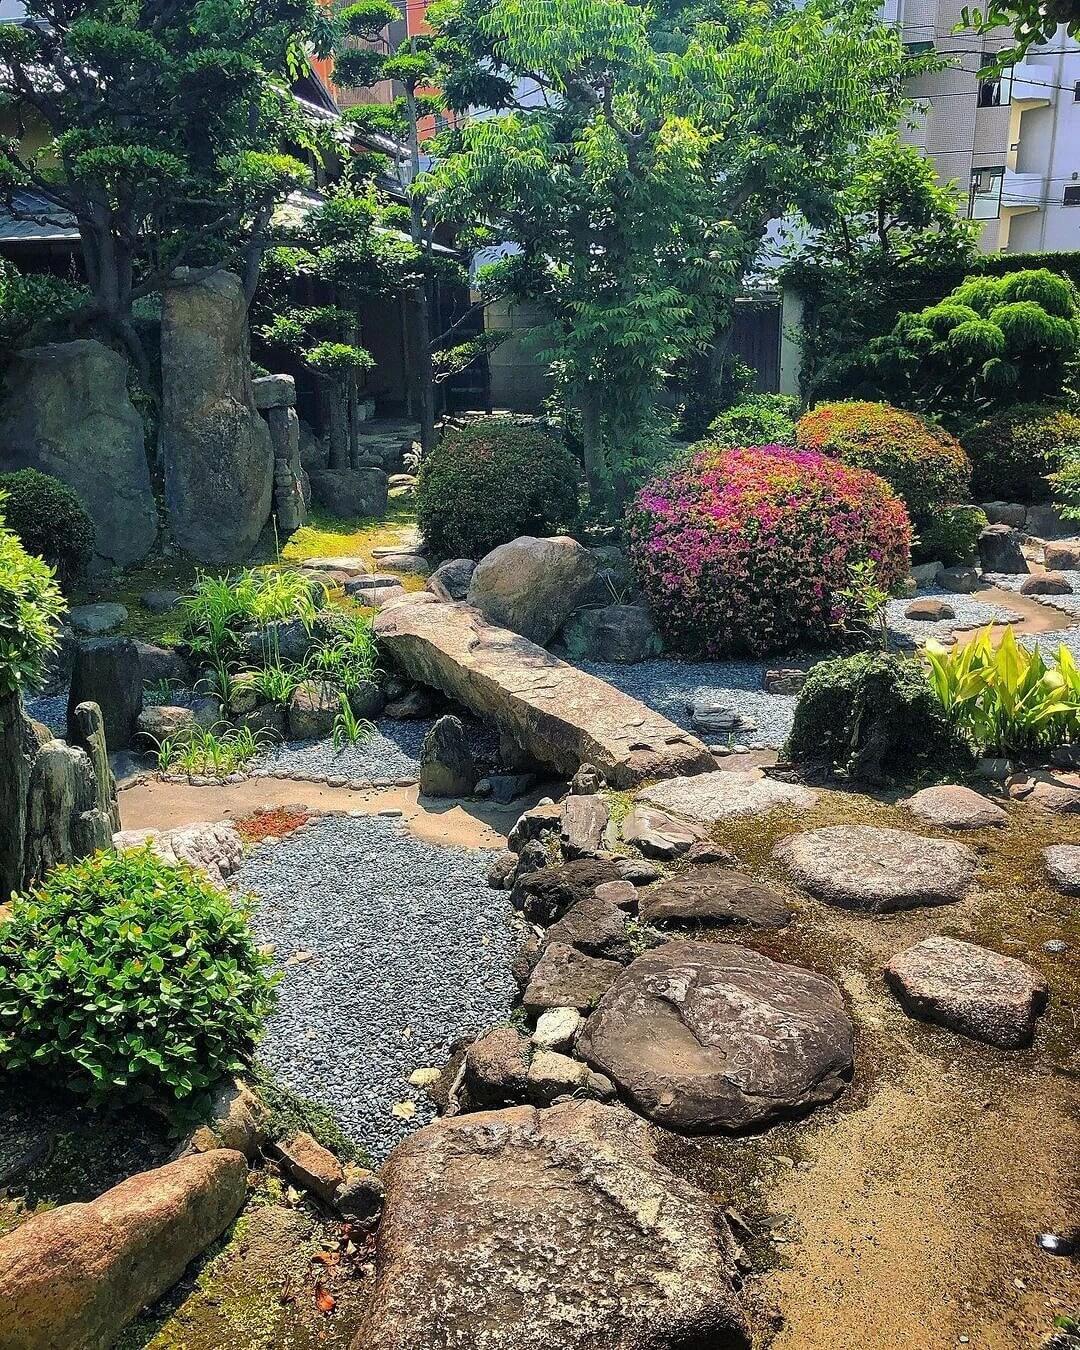 2. Japanese